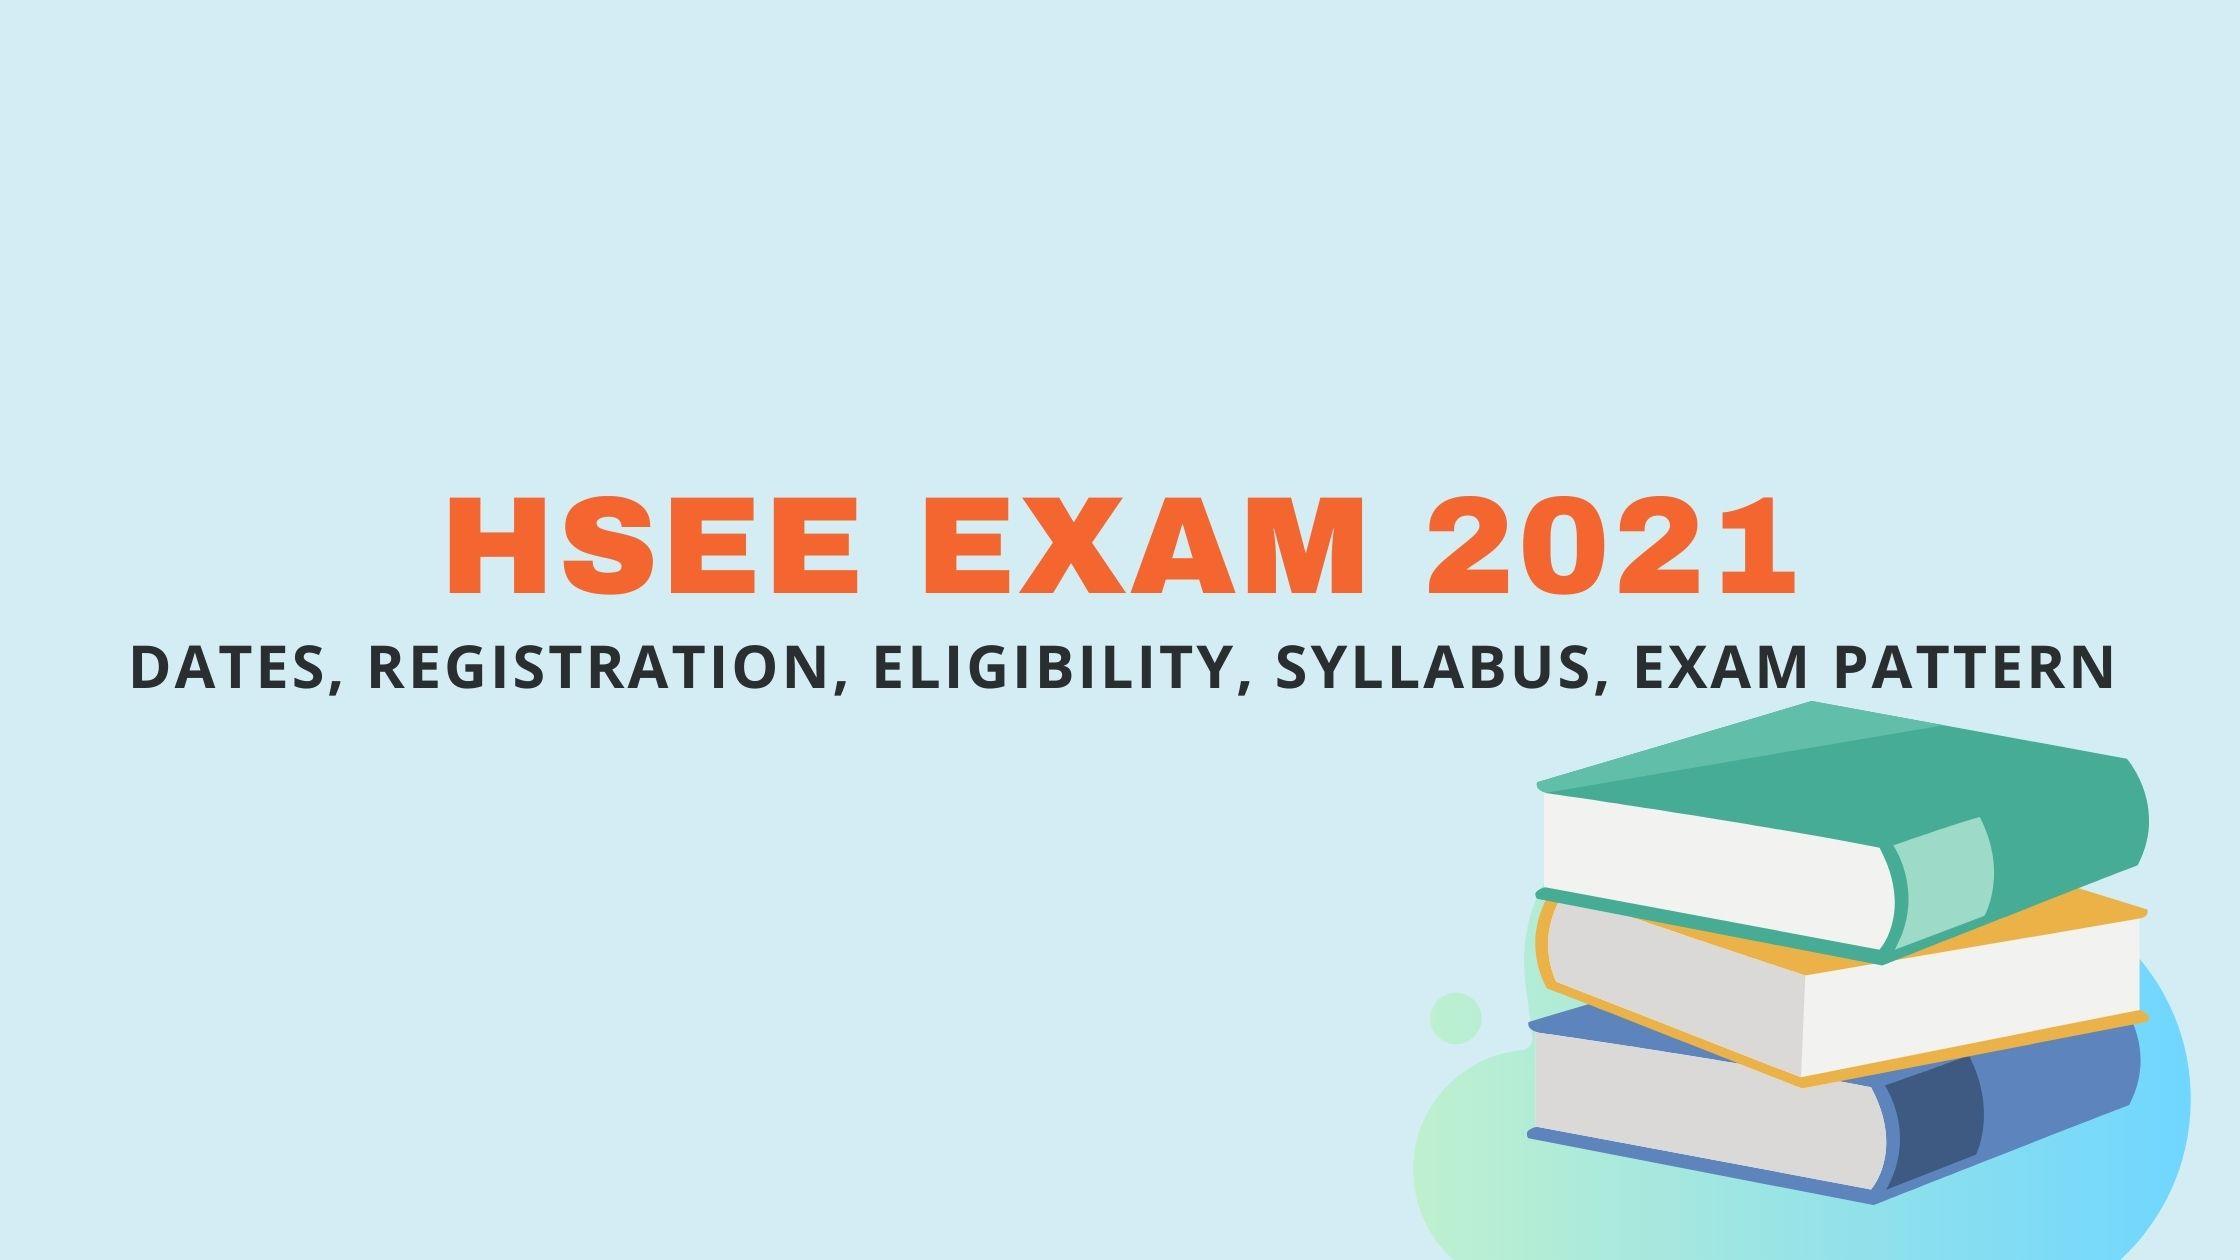 HSEE Exam 2021 – Dates, Registration, Eligibility, Syllabus, Exam Pattern